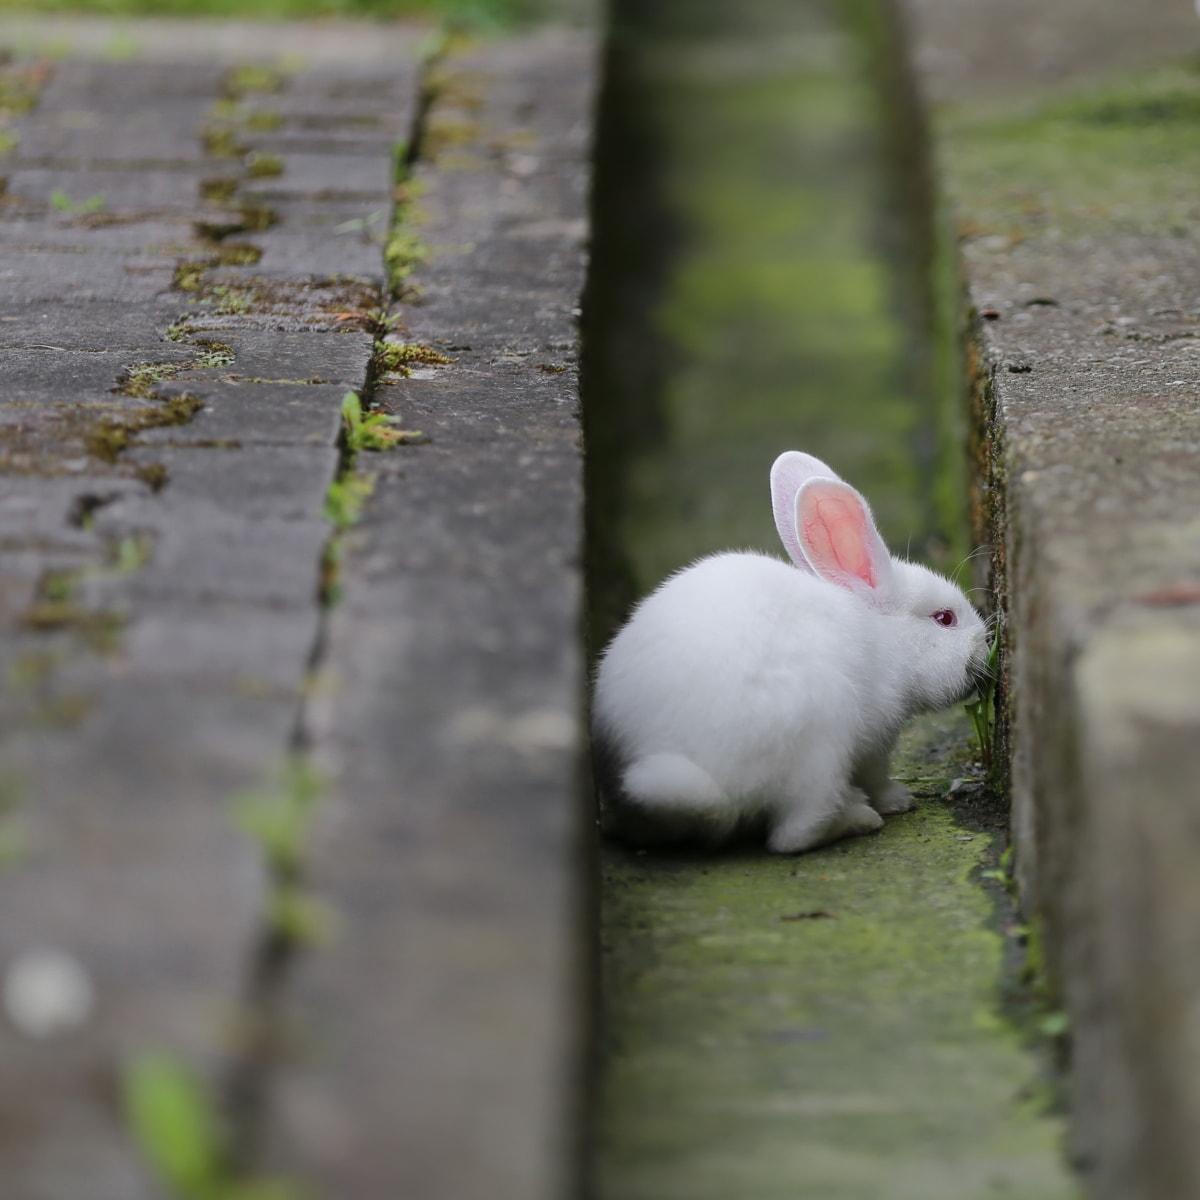 rabbit, pet, albino, rodent, bunny, animal, fur, cute, nature, grass